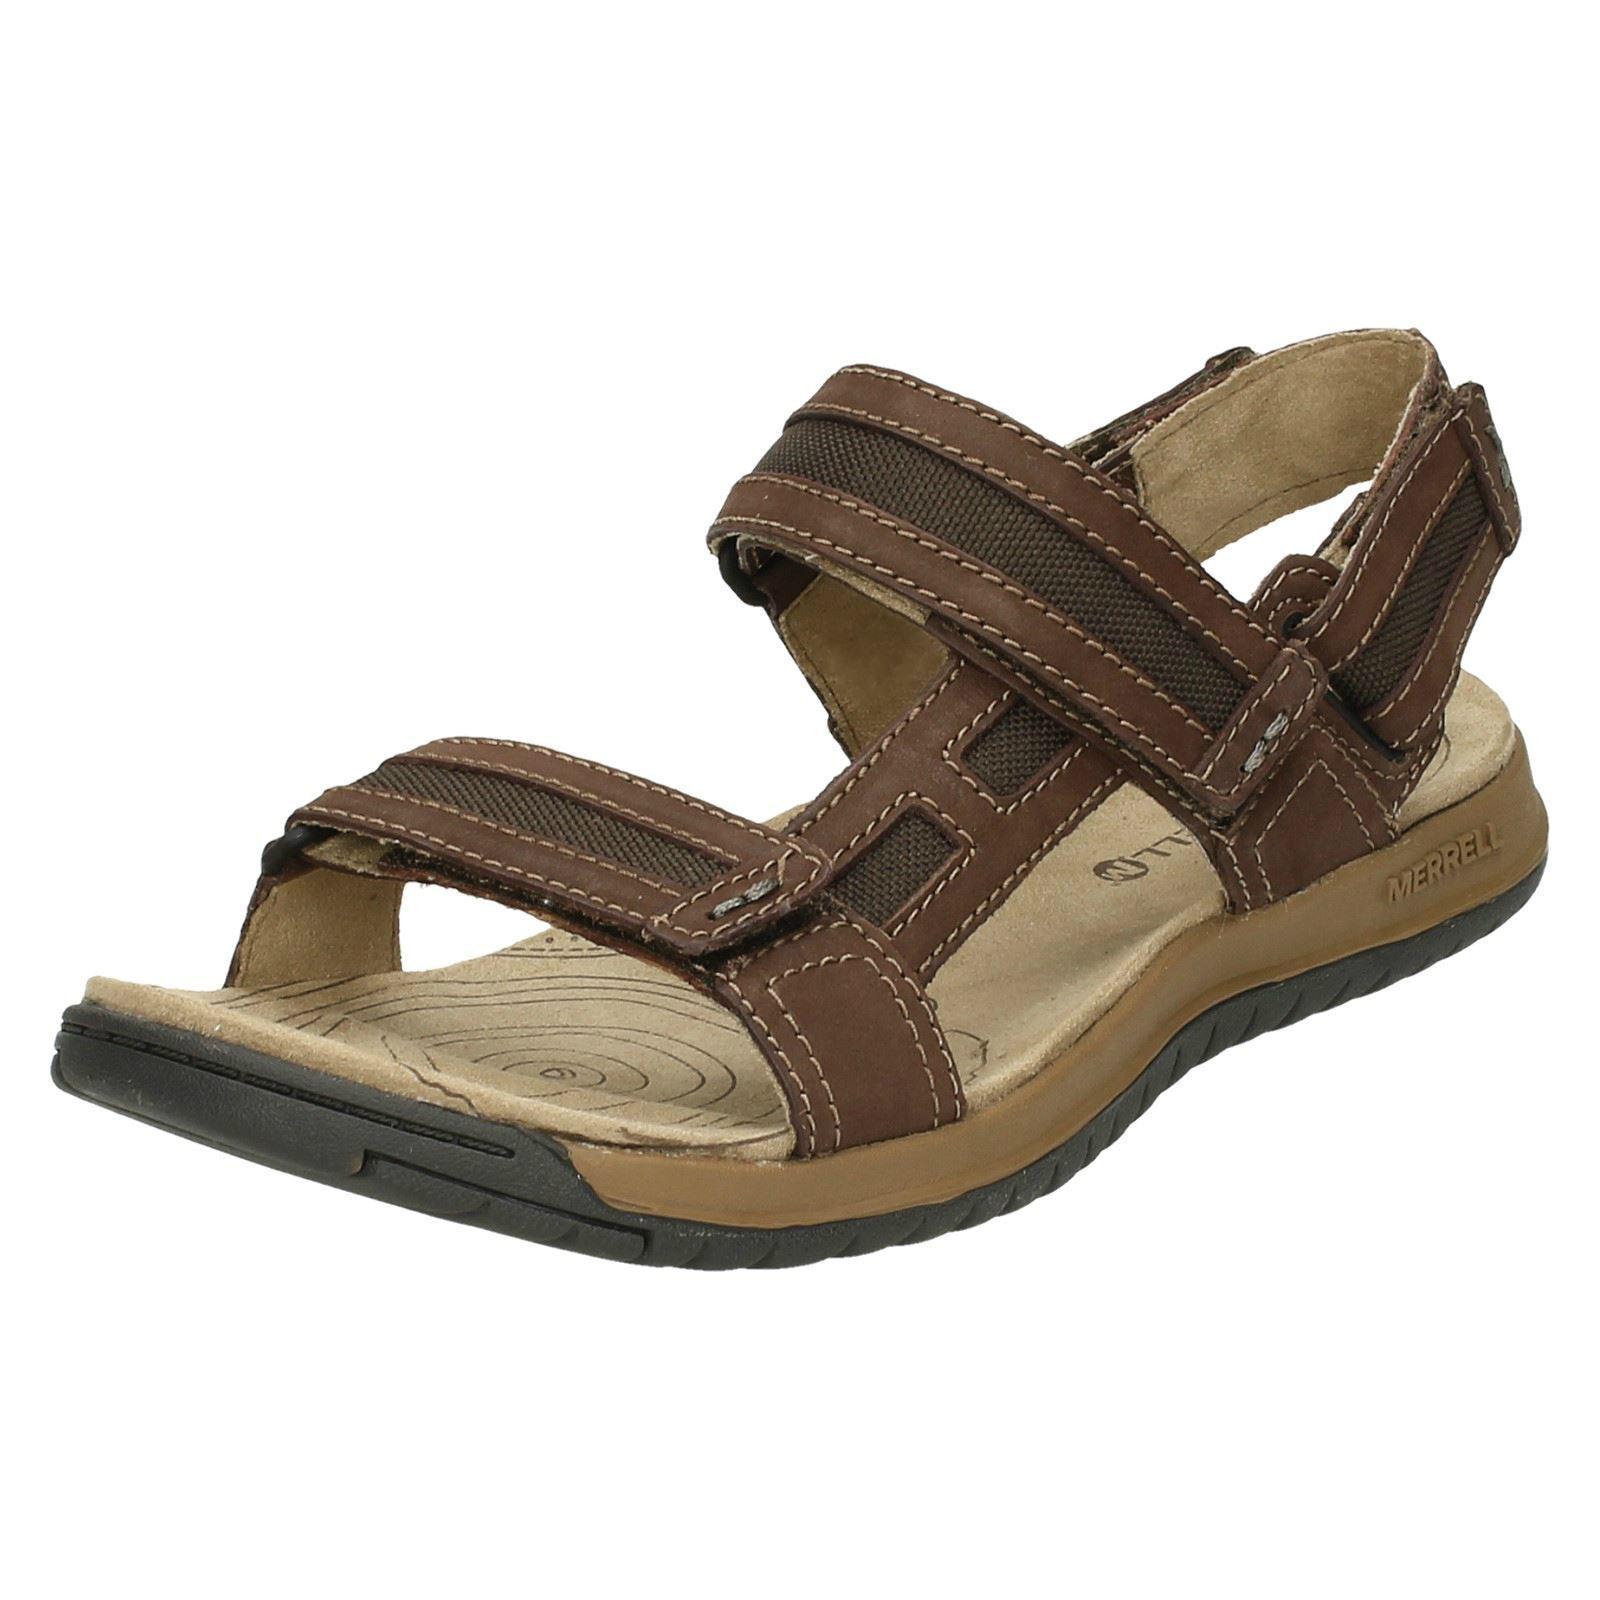 Mens Merrell Strapped Hook & Loop Leather Sandals Traveler Tilt Convertible